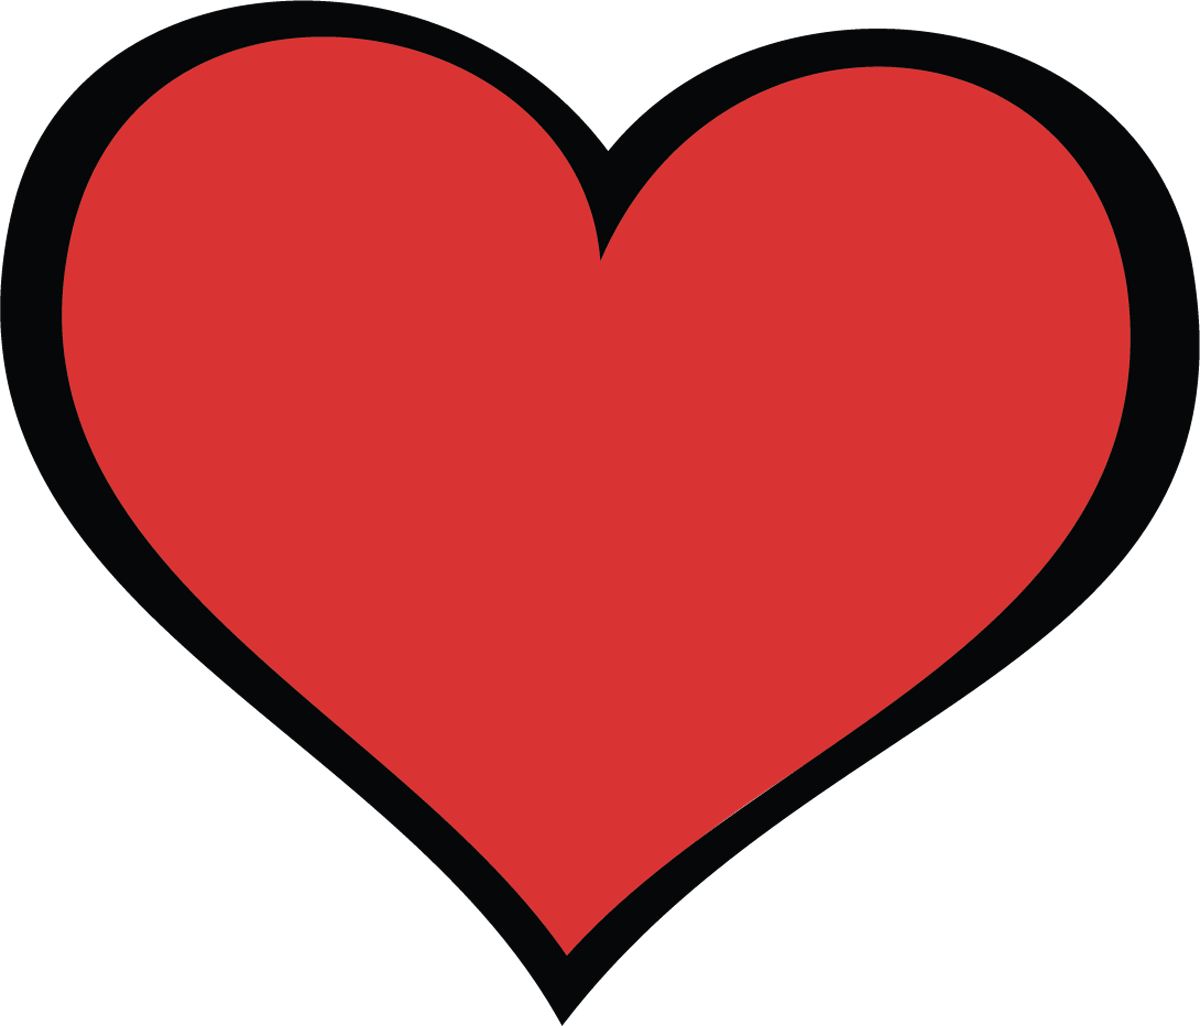 clipart love heart